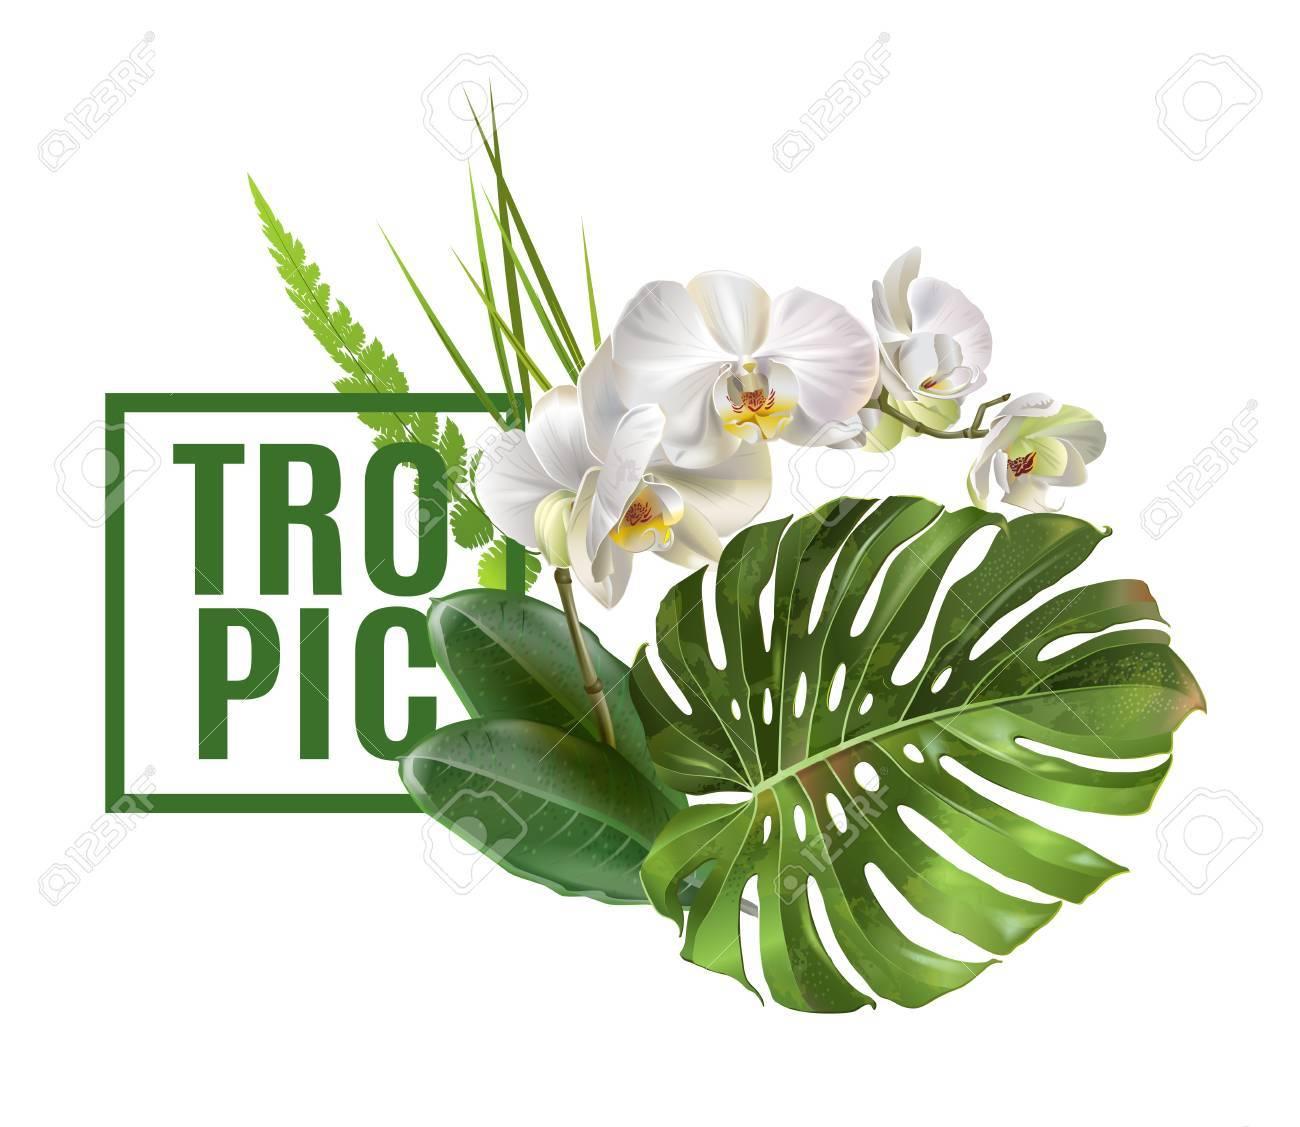 Tropic plants banner - 90041685